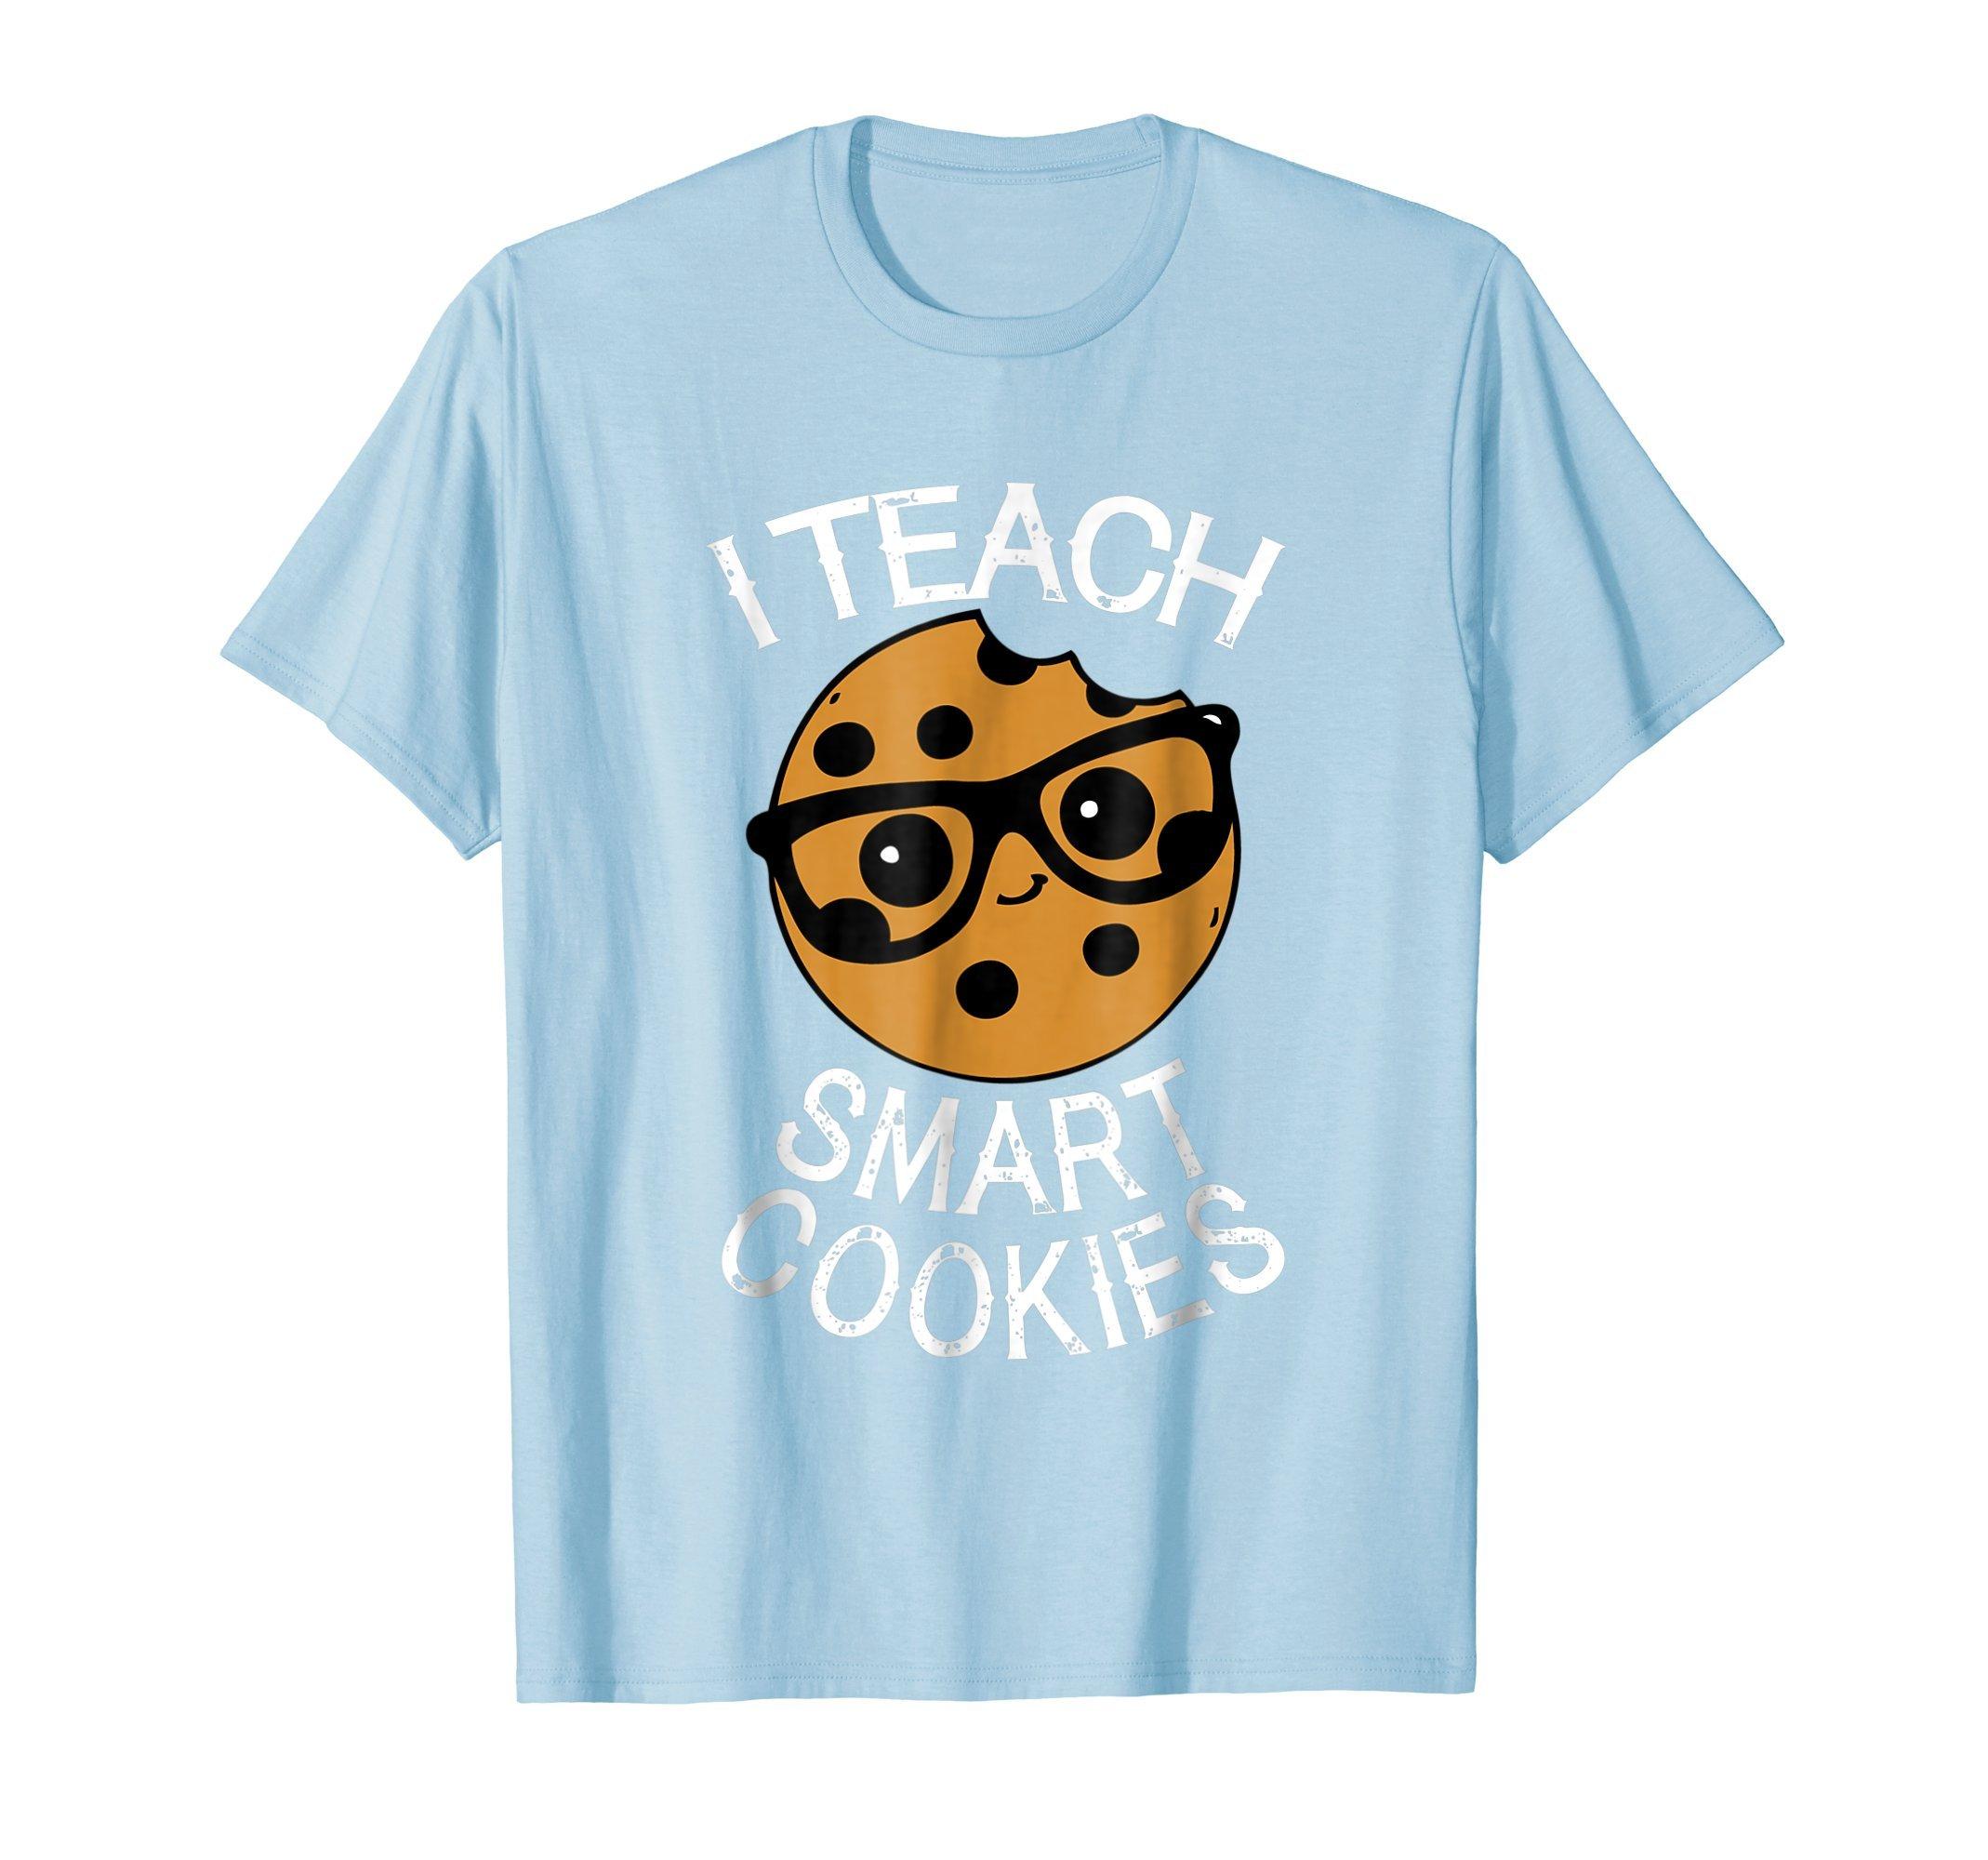 Shop Funny Tea Shirt I Teach Smart Cookies Shirt Nerd Tee Many Type